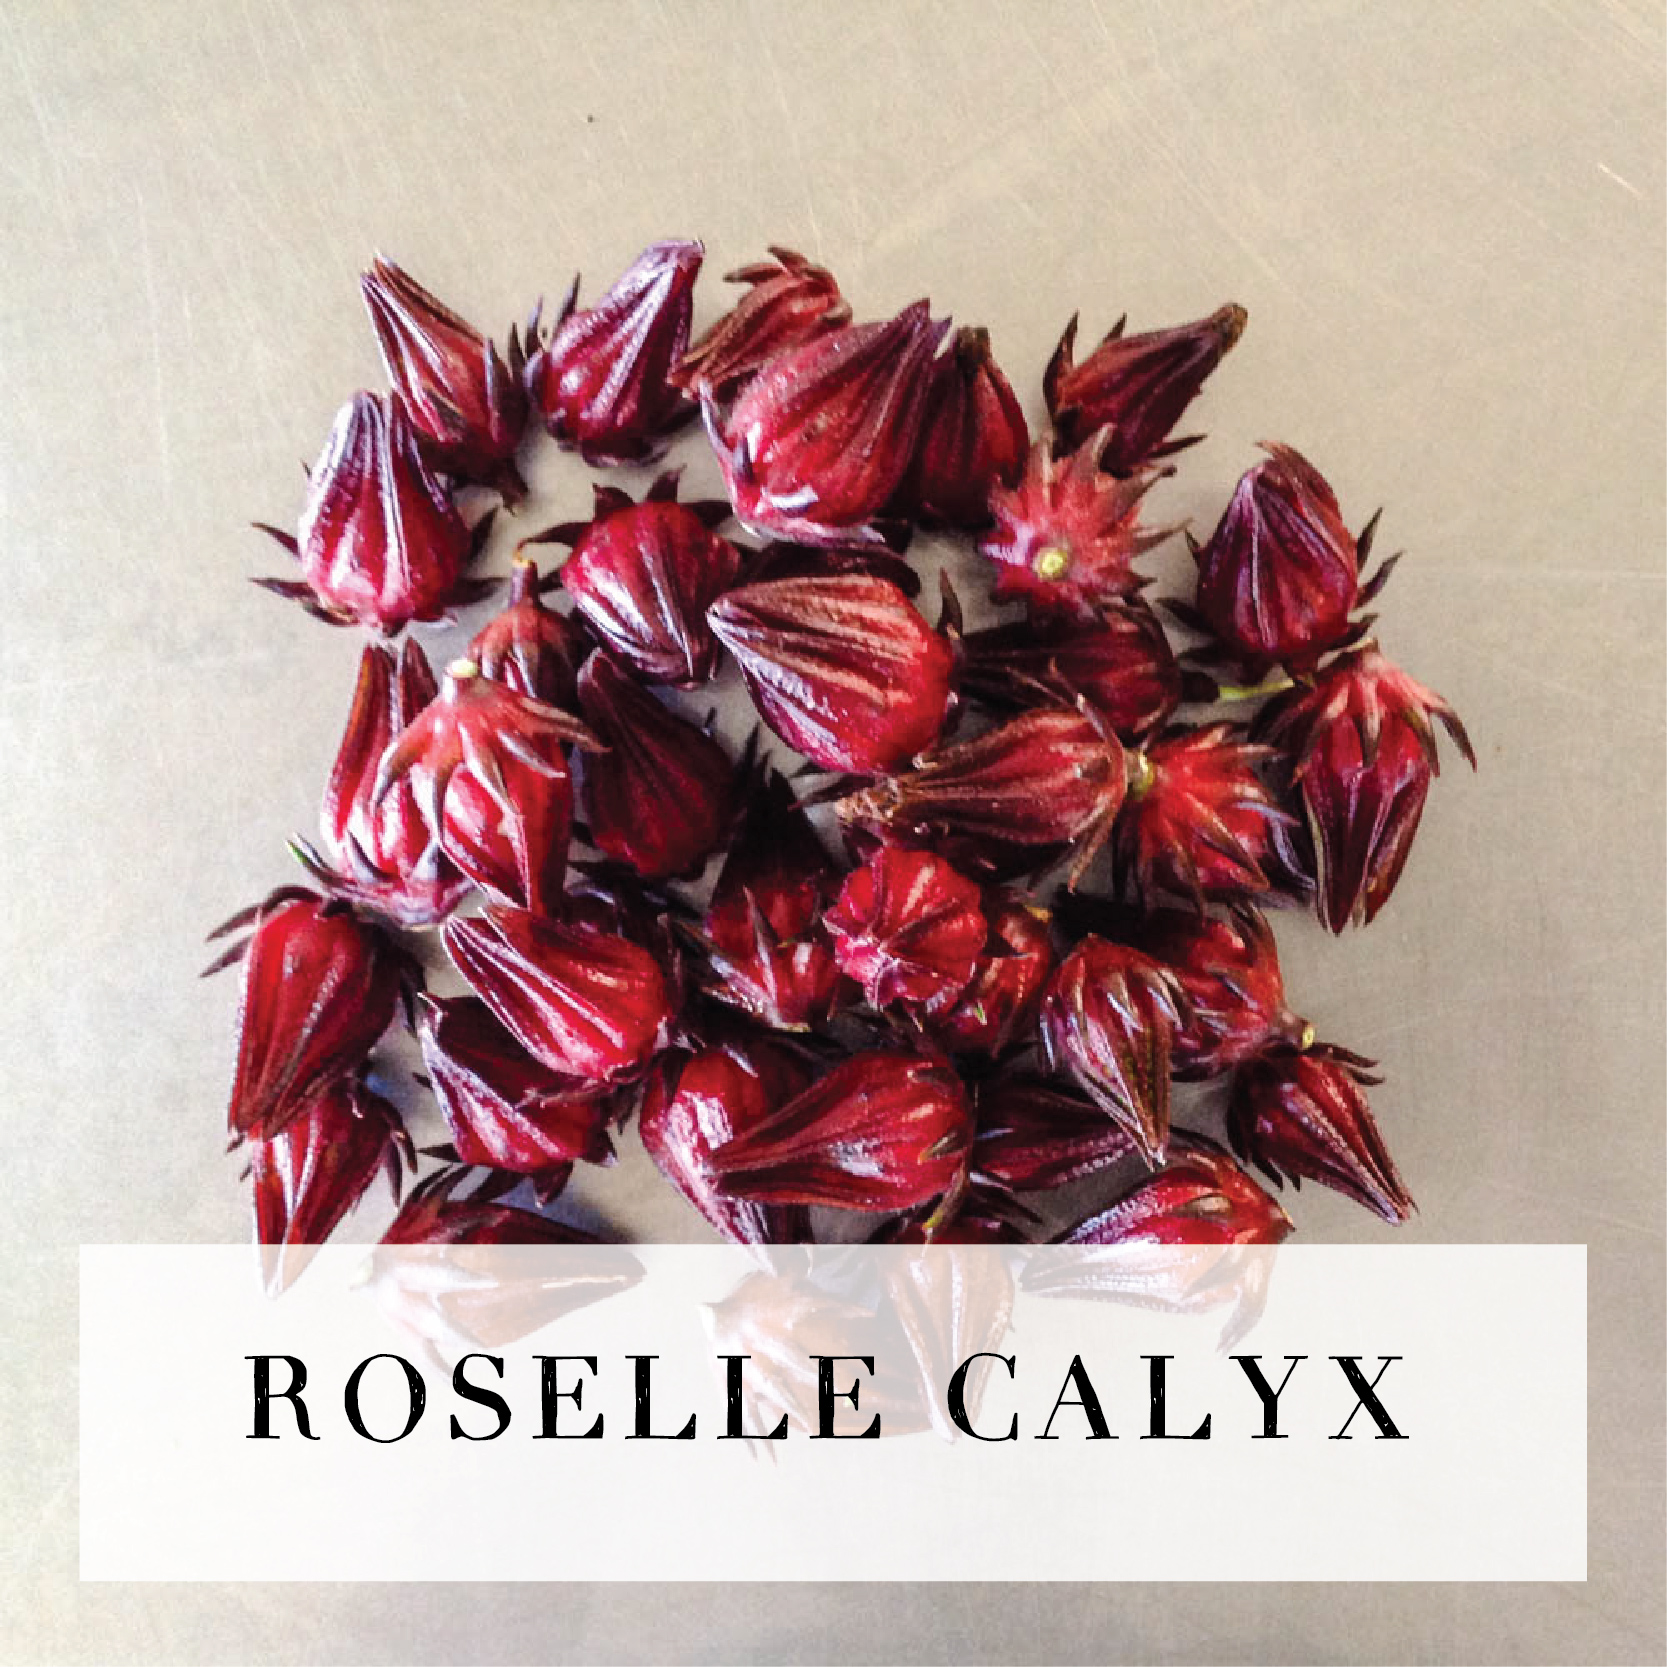 rosellecalyx.jpg